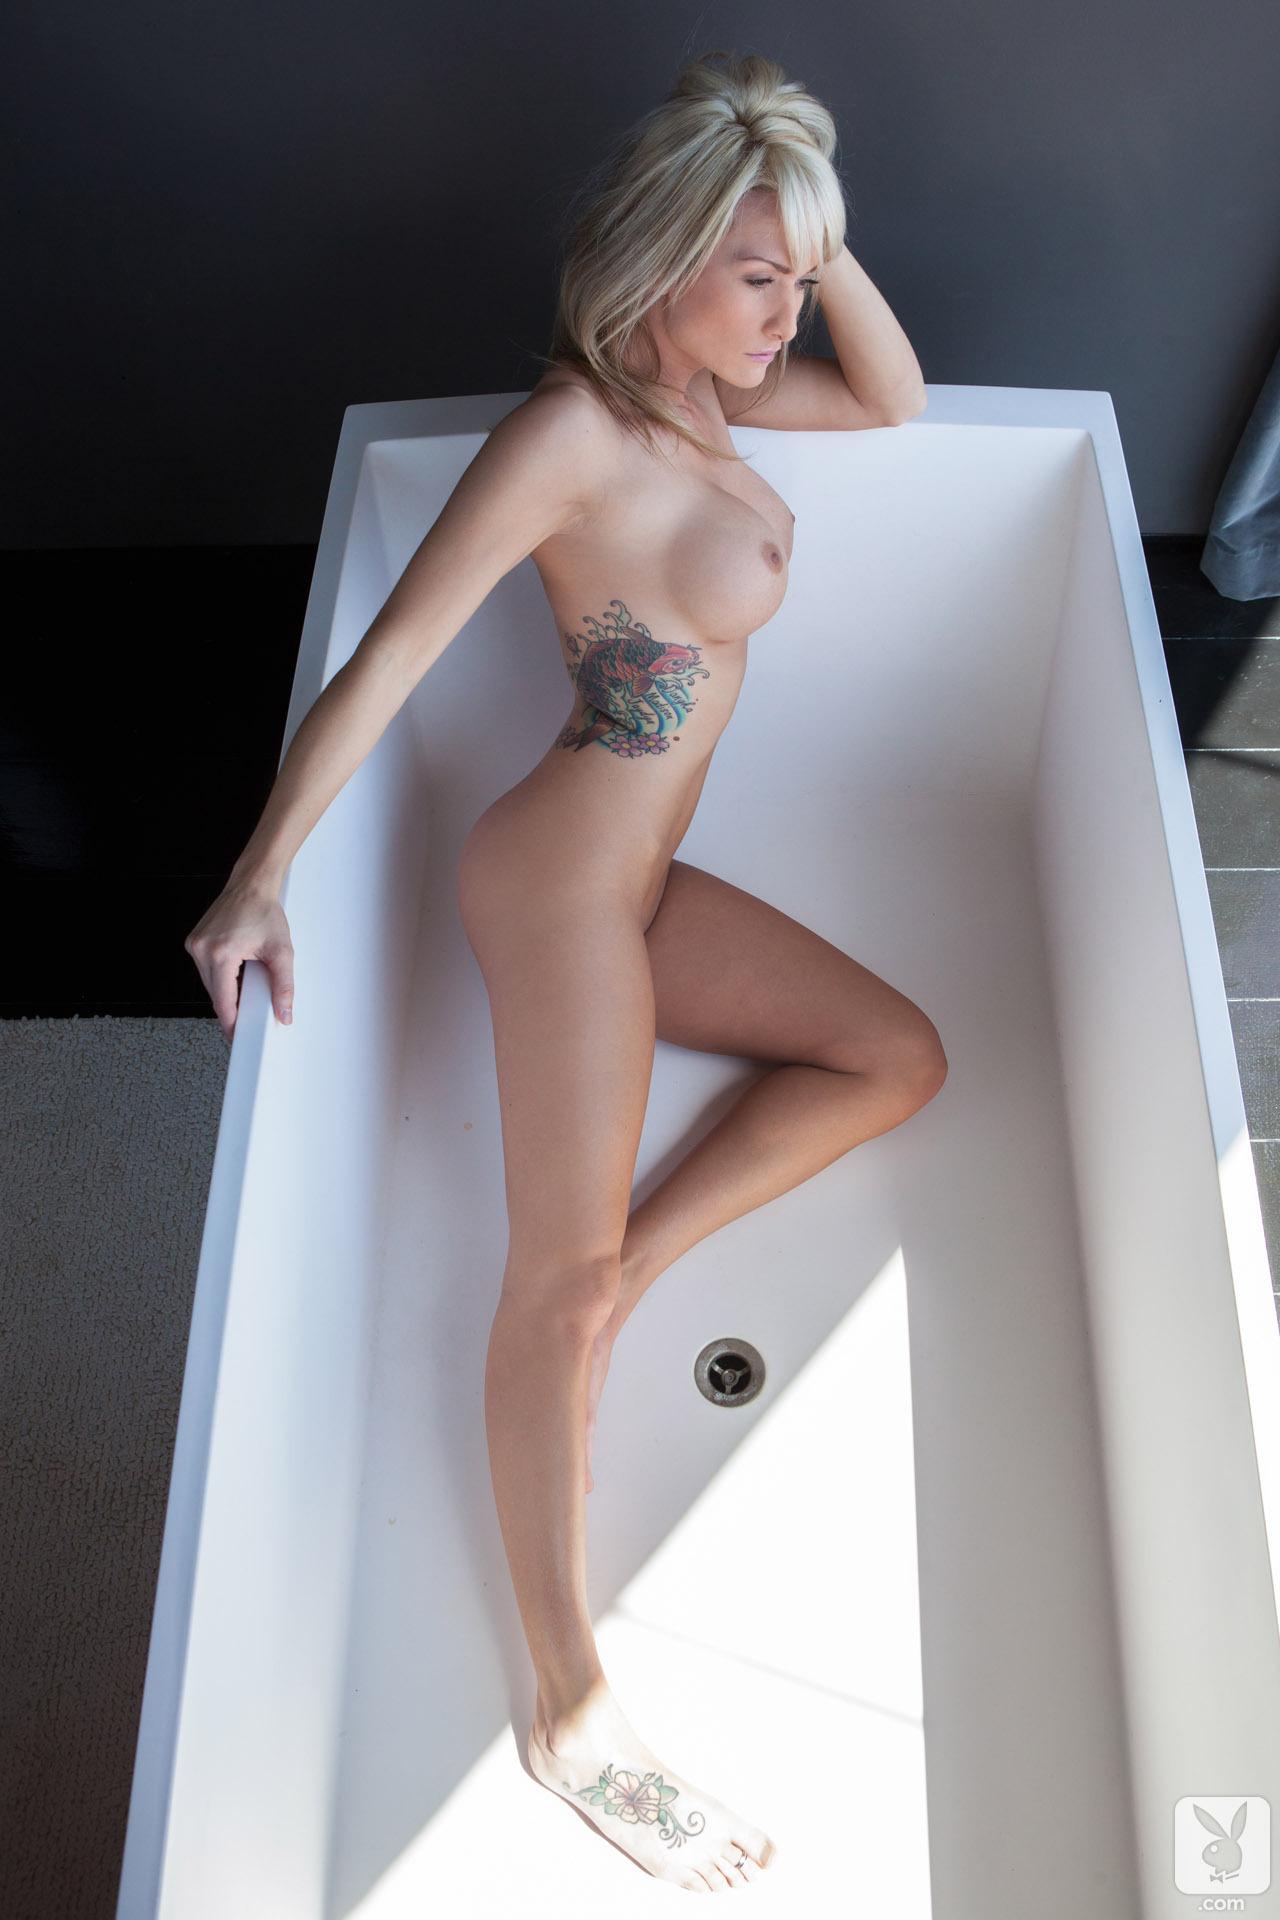 jessie-ann-blonde-boobs-bathtube-naked-playboy-19